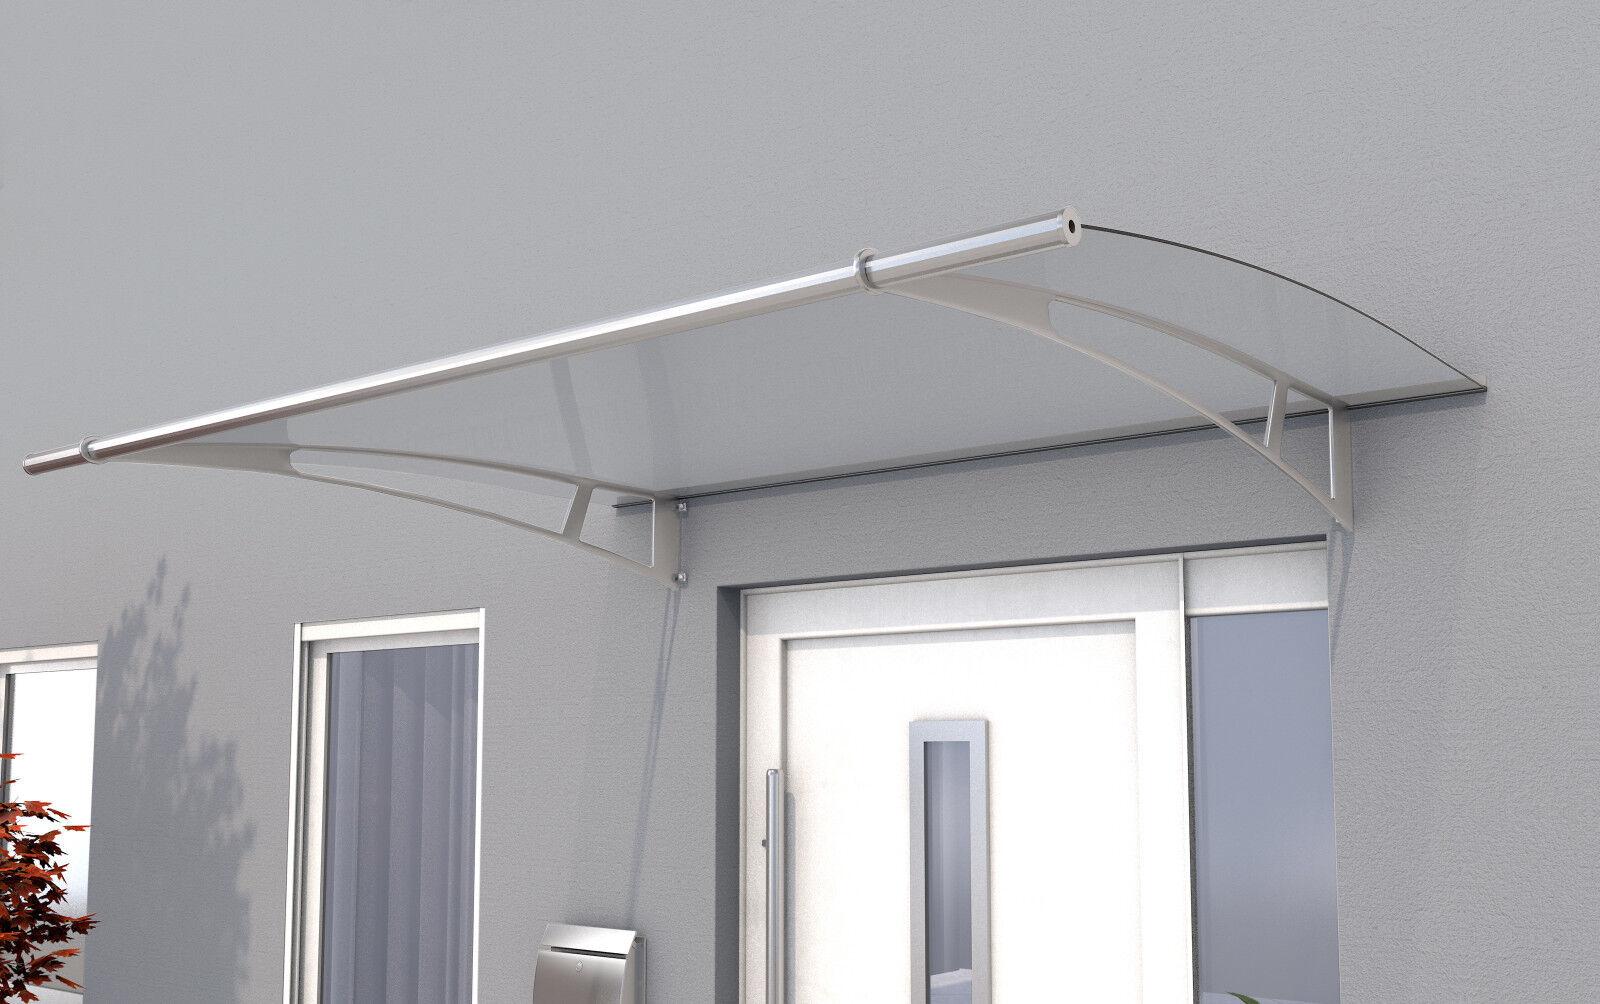 Gutta Pultvordach PT/XL 205 klar - Haustürvordach 205 x 142 cm mit Acrylglas